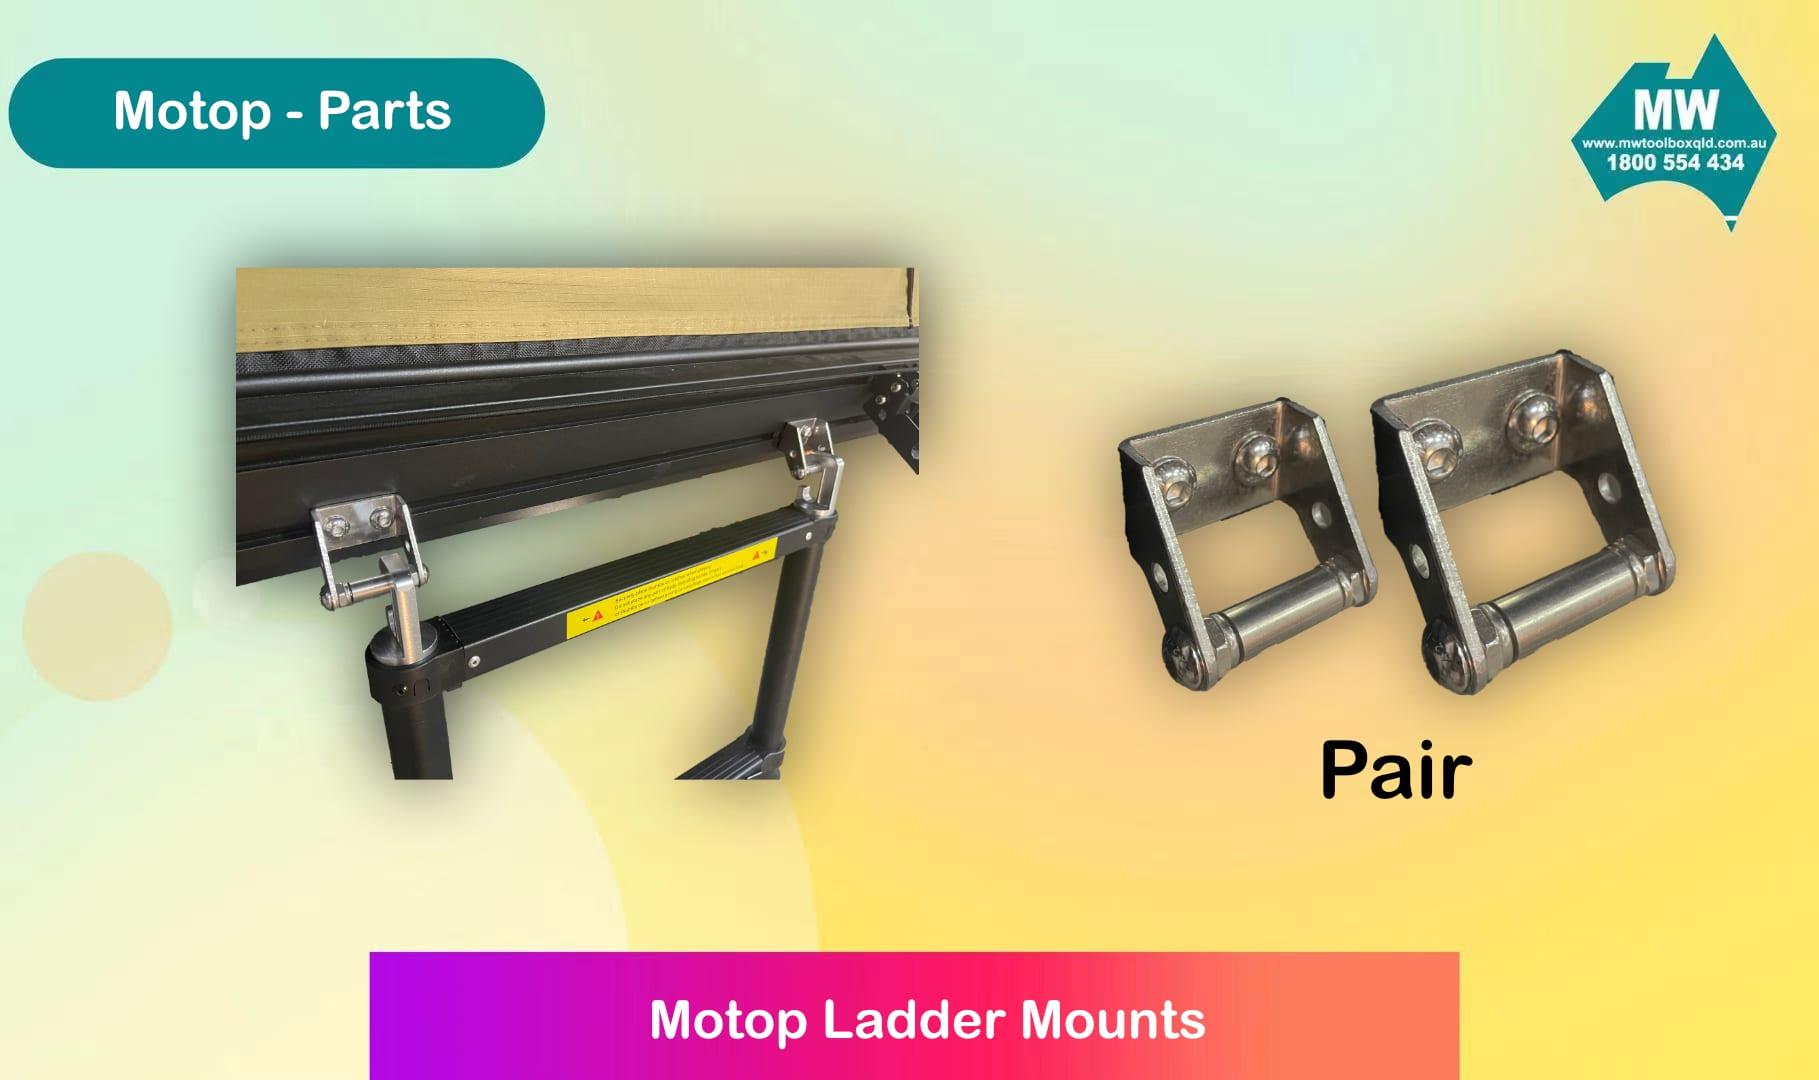 Ladder Mounts